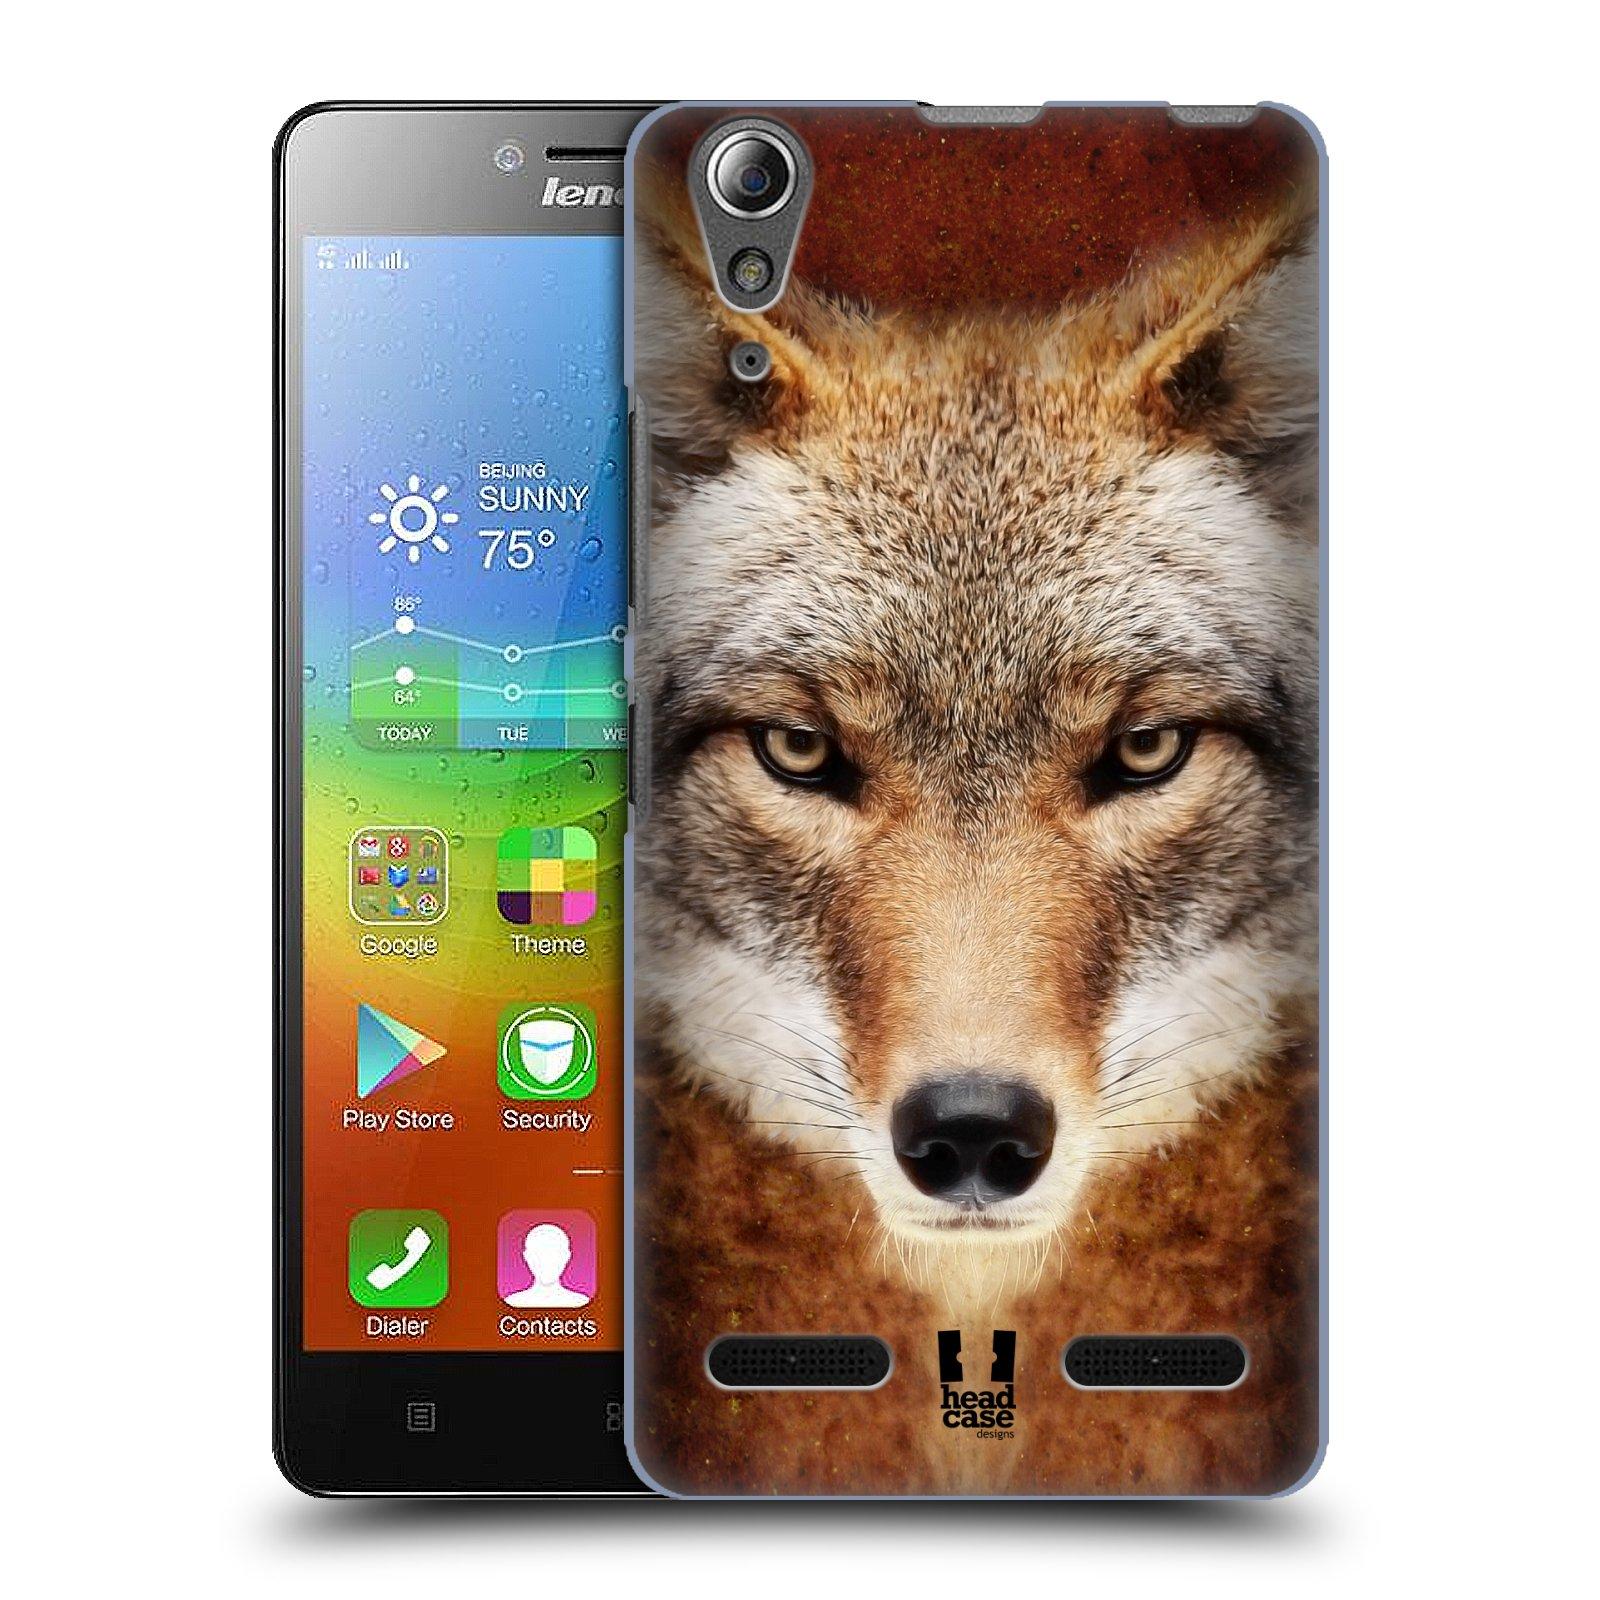 HEAD CASE pevný plastový obal na mobil LENOVO A6000 / A6000 PLUS vzor Zvířecí tváře kojot